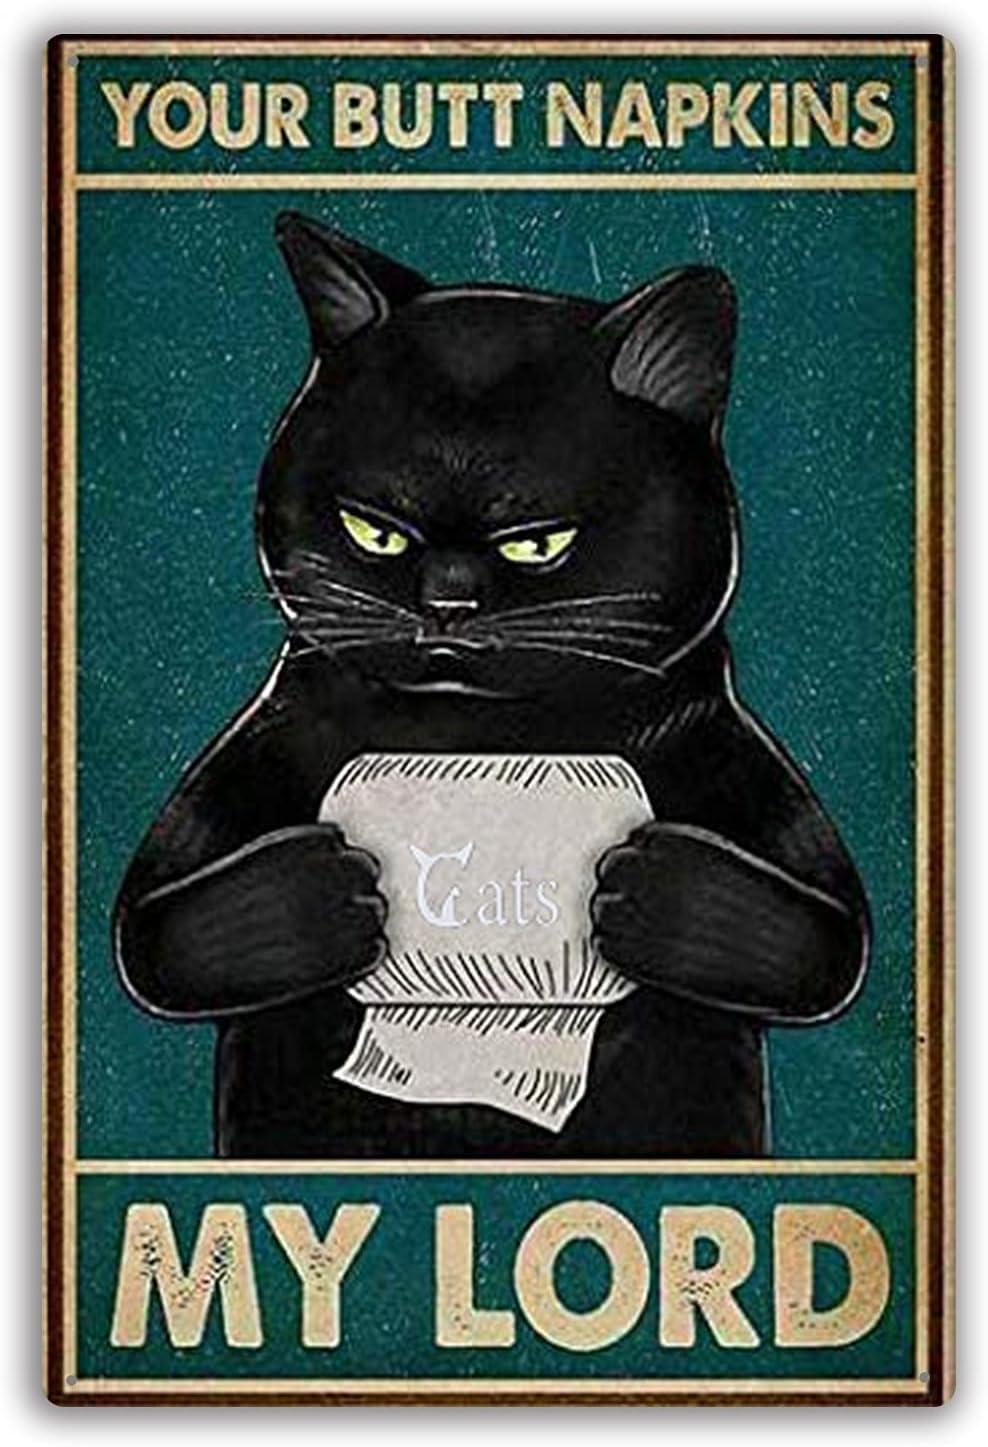 Funny Black Cat Tin Sign Cat Toilet Paper Metal Sign Wall Art Decor, Public Sign, Decoration Sign for Home Dorm Hotel Bathroom Idea Gifts for Women Men Friends 8